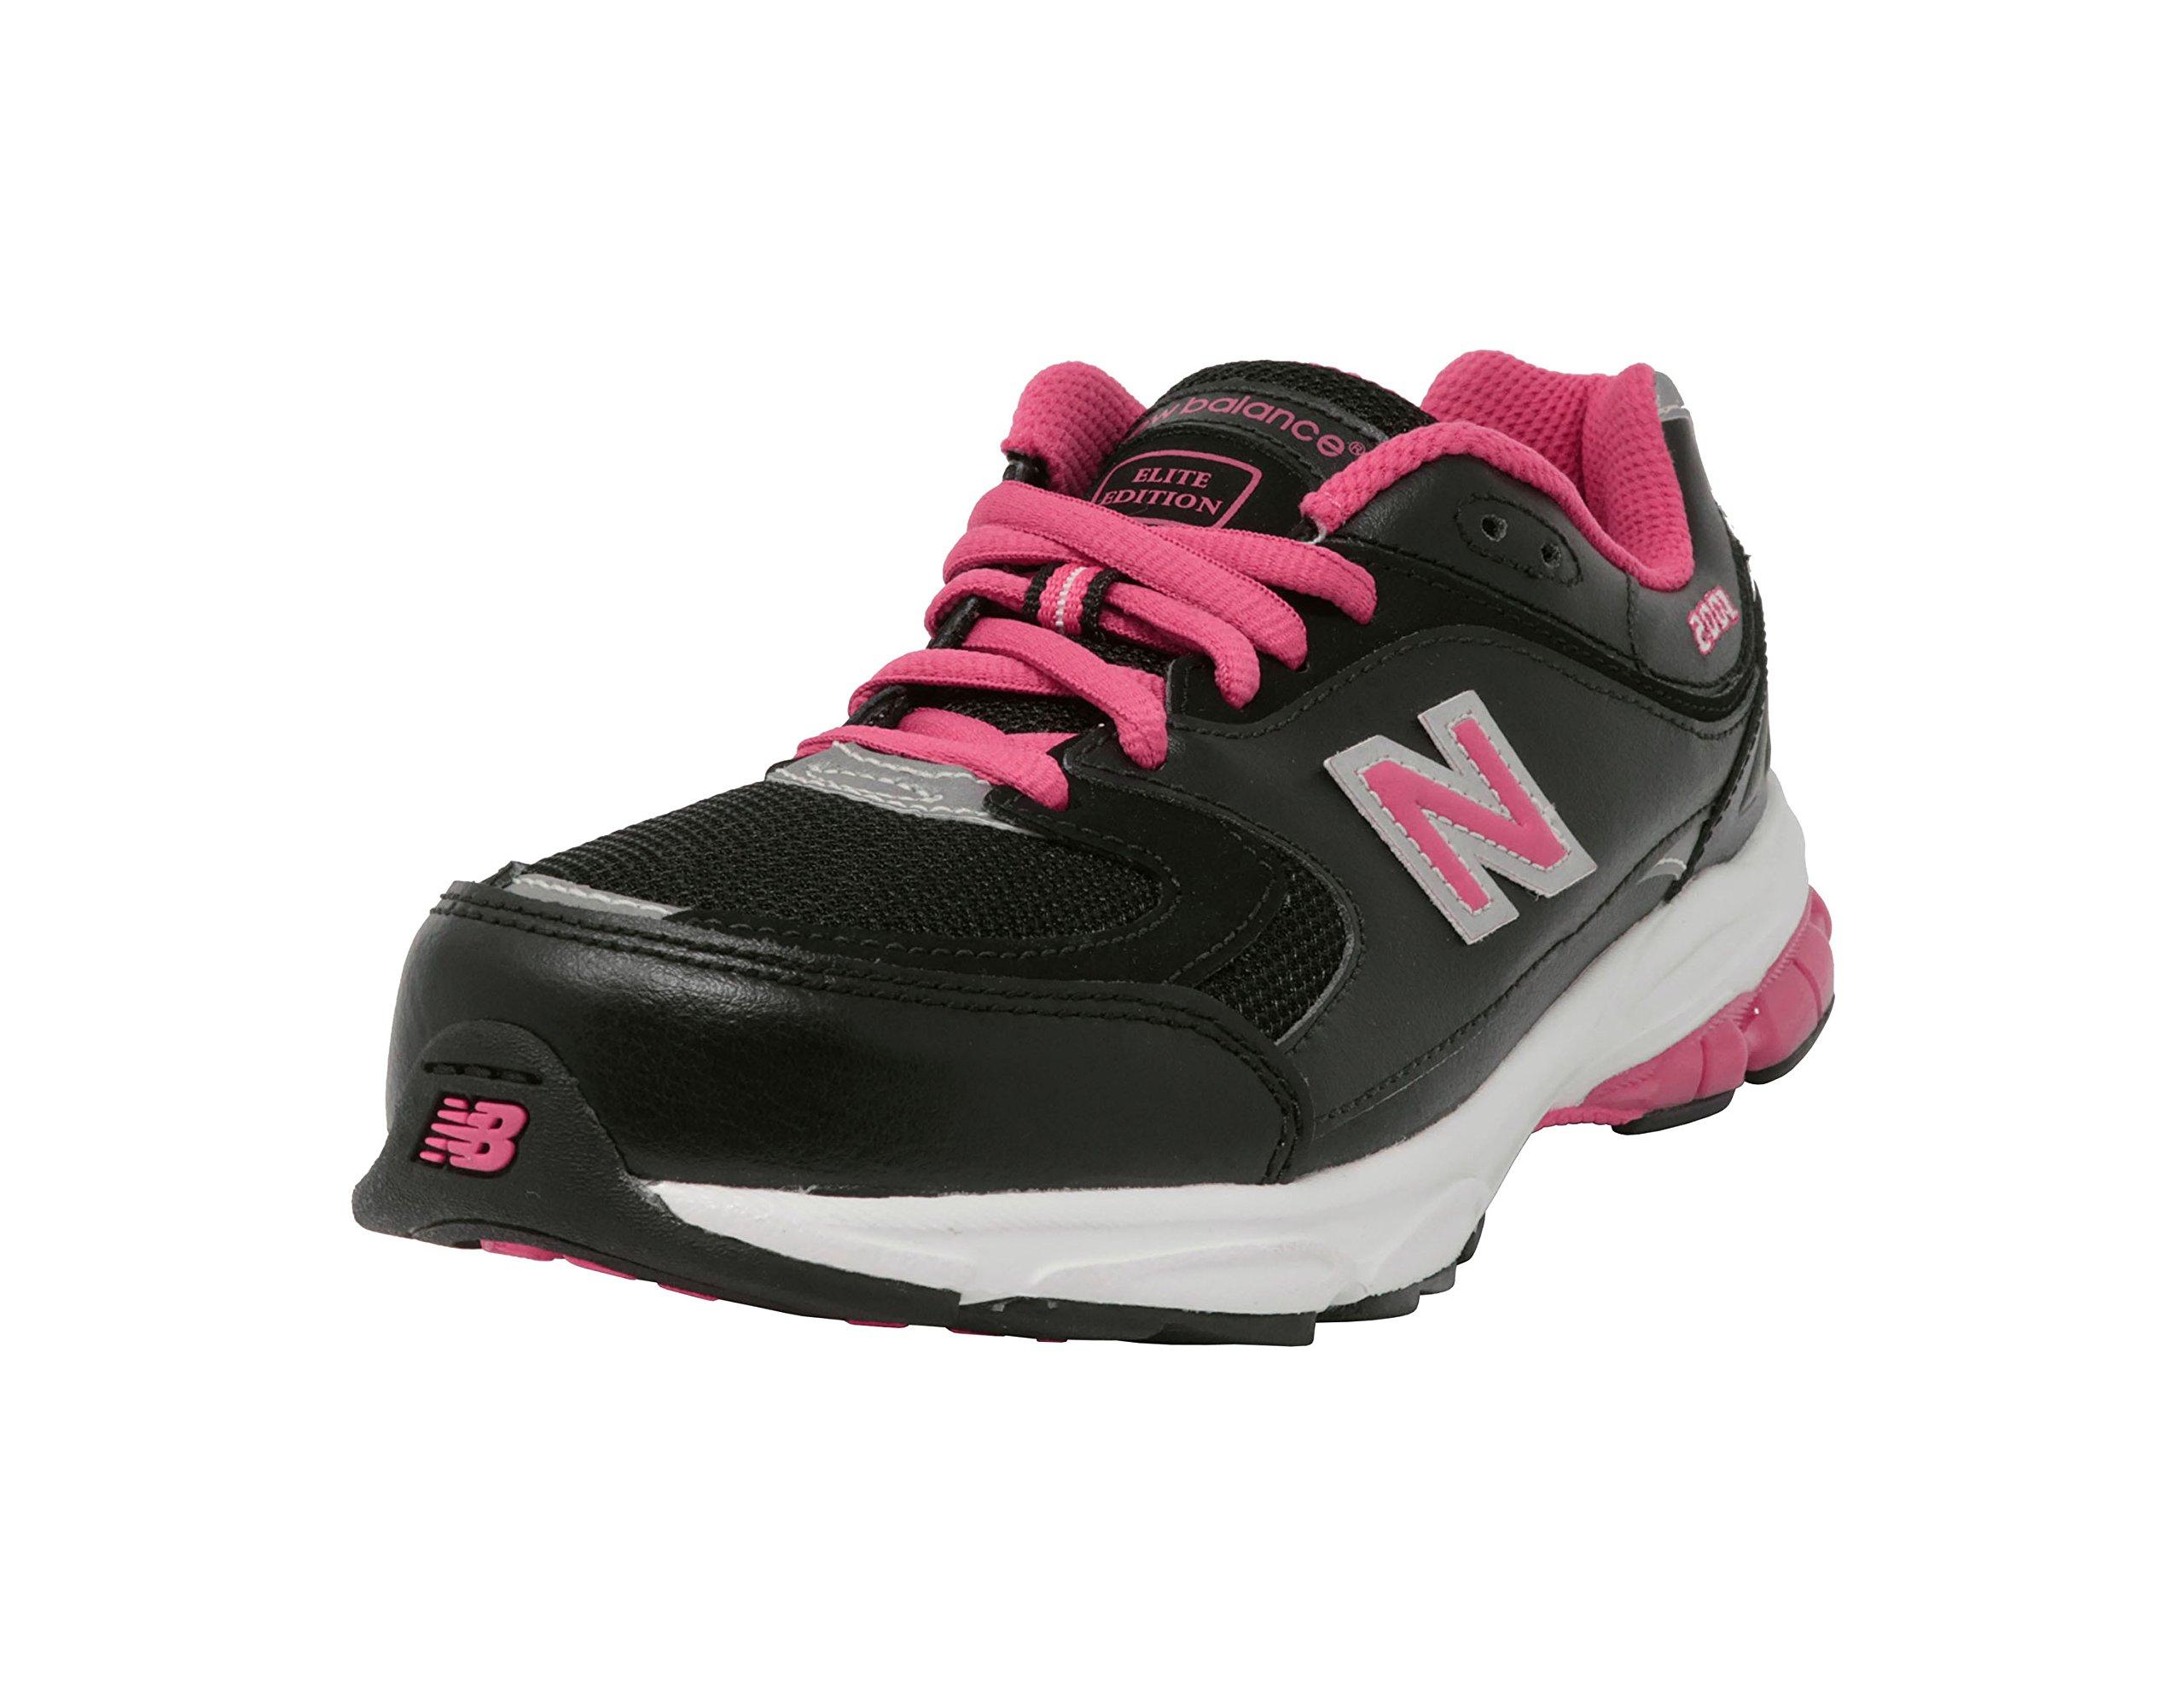 New Balance K2001 Womens Size 5.5 Black Leather Cross Training Shoes